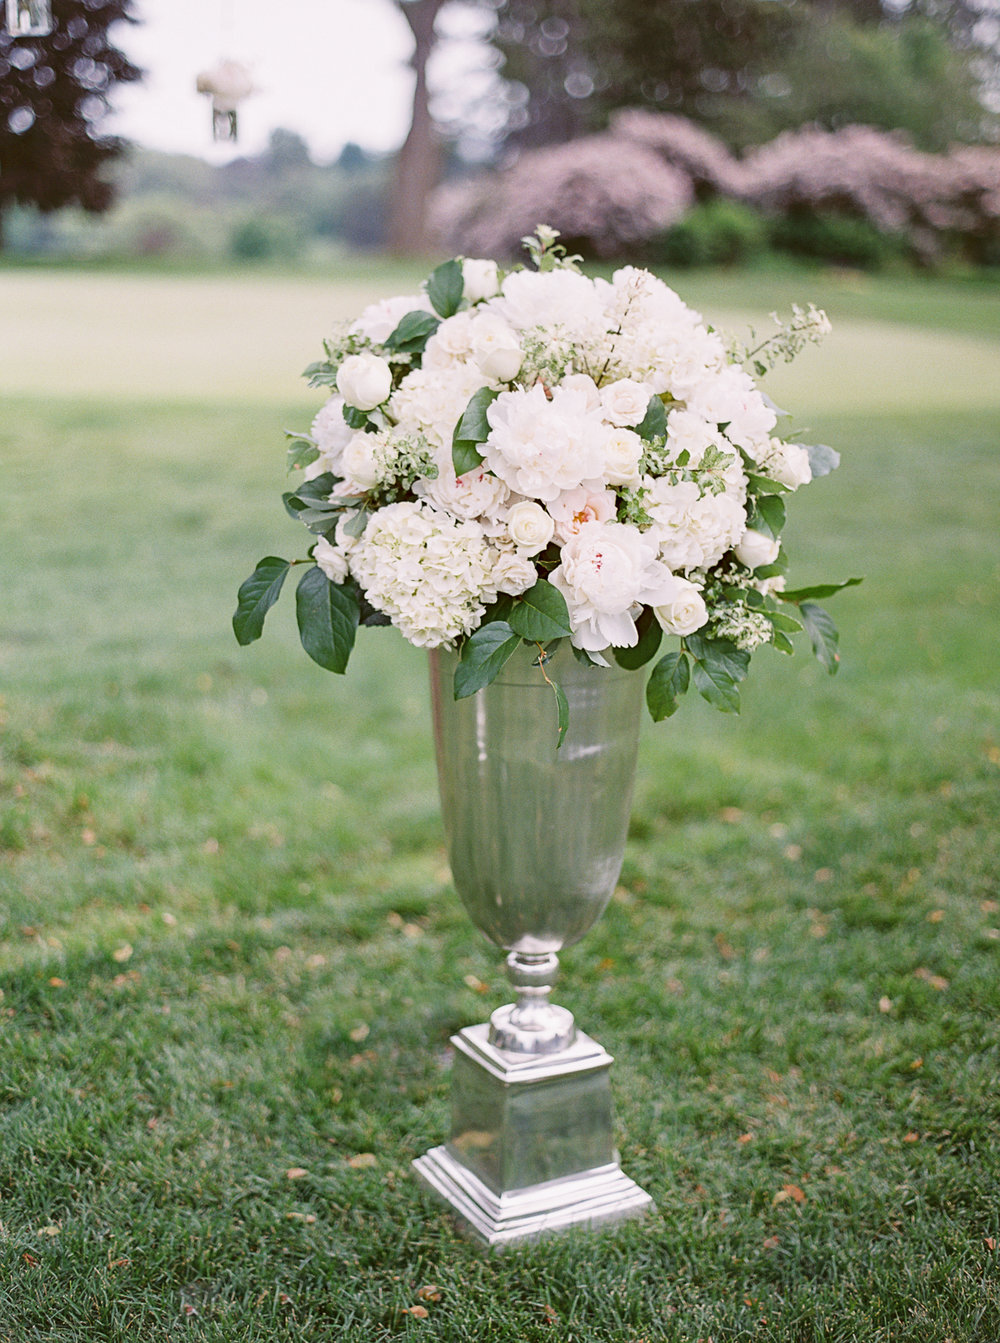 0527-Nadia-Chris-Married-When He Founf Her-Toronto Golf Club.jpg